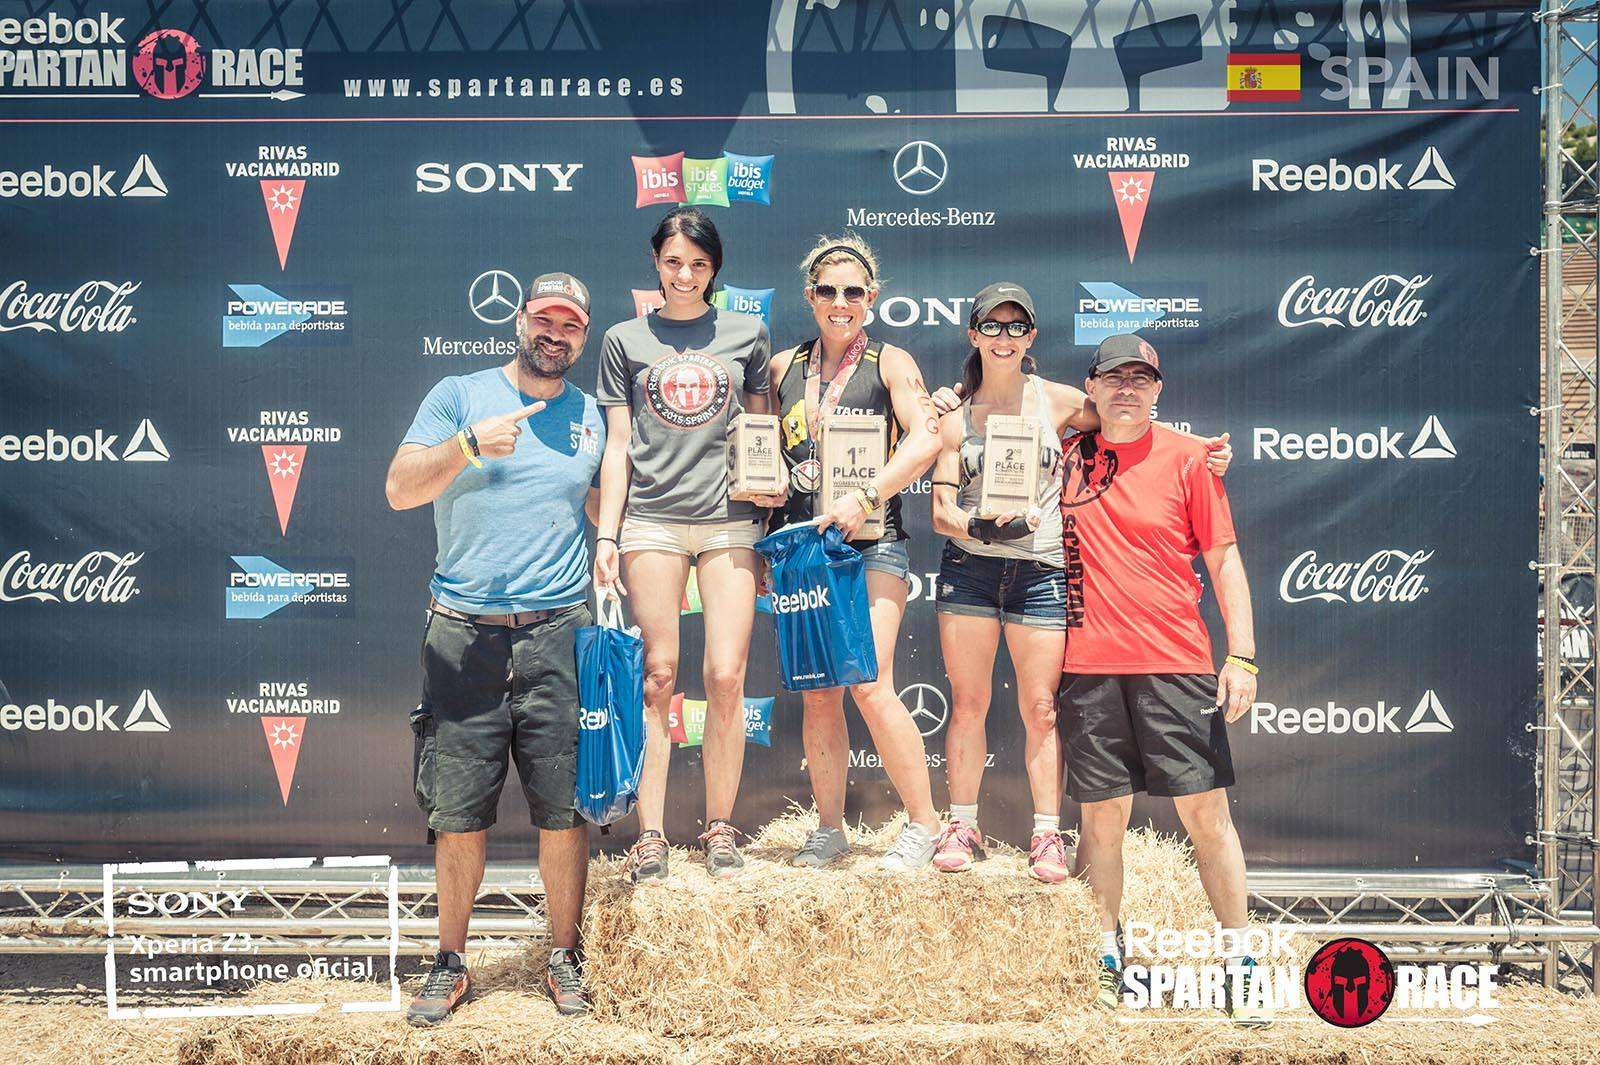 Ganadoras Spartan Race Madrid